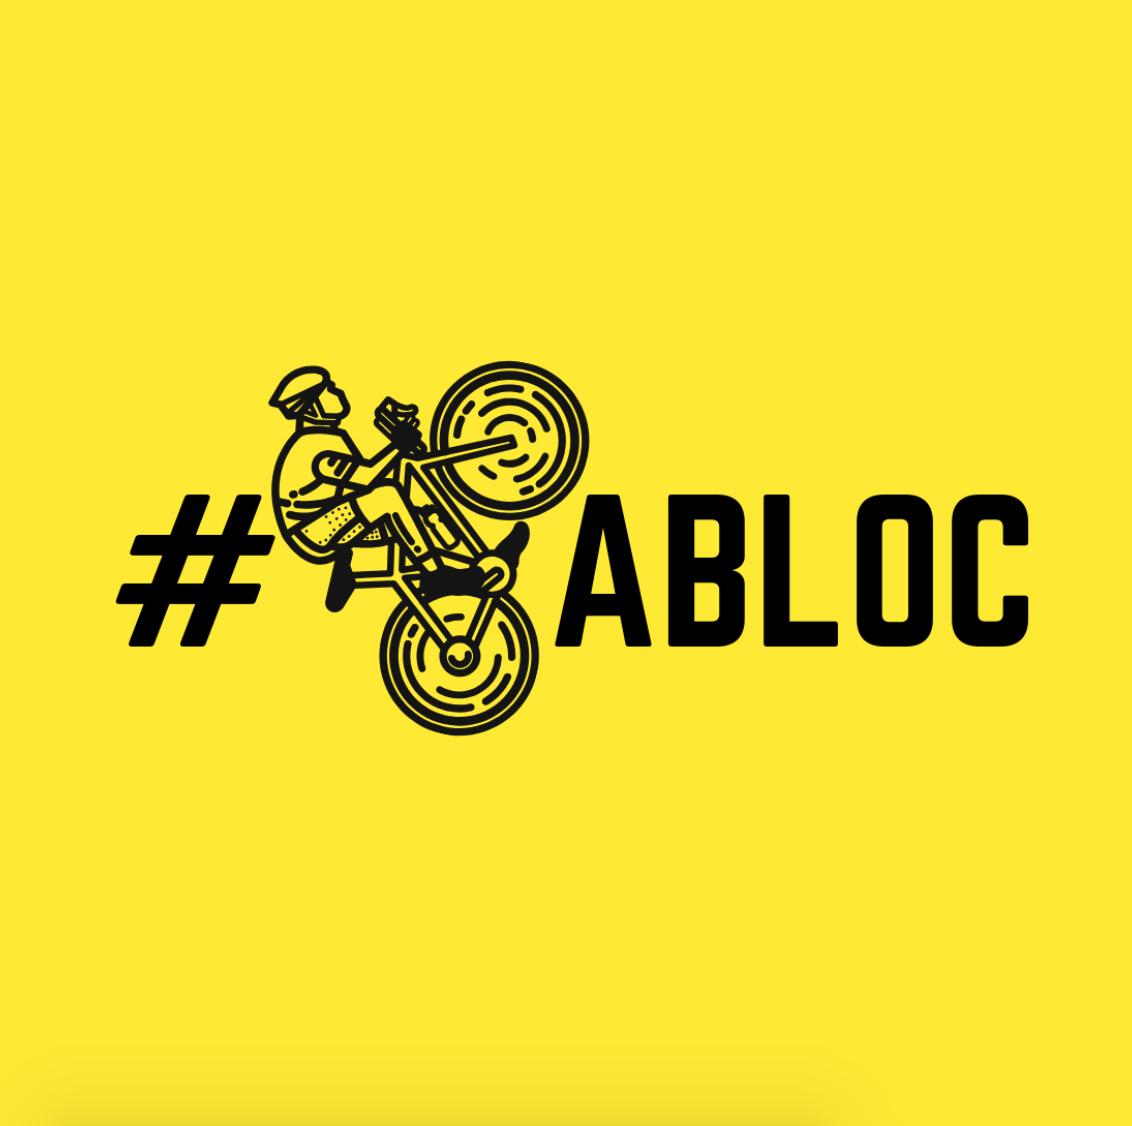 veloabloc logo